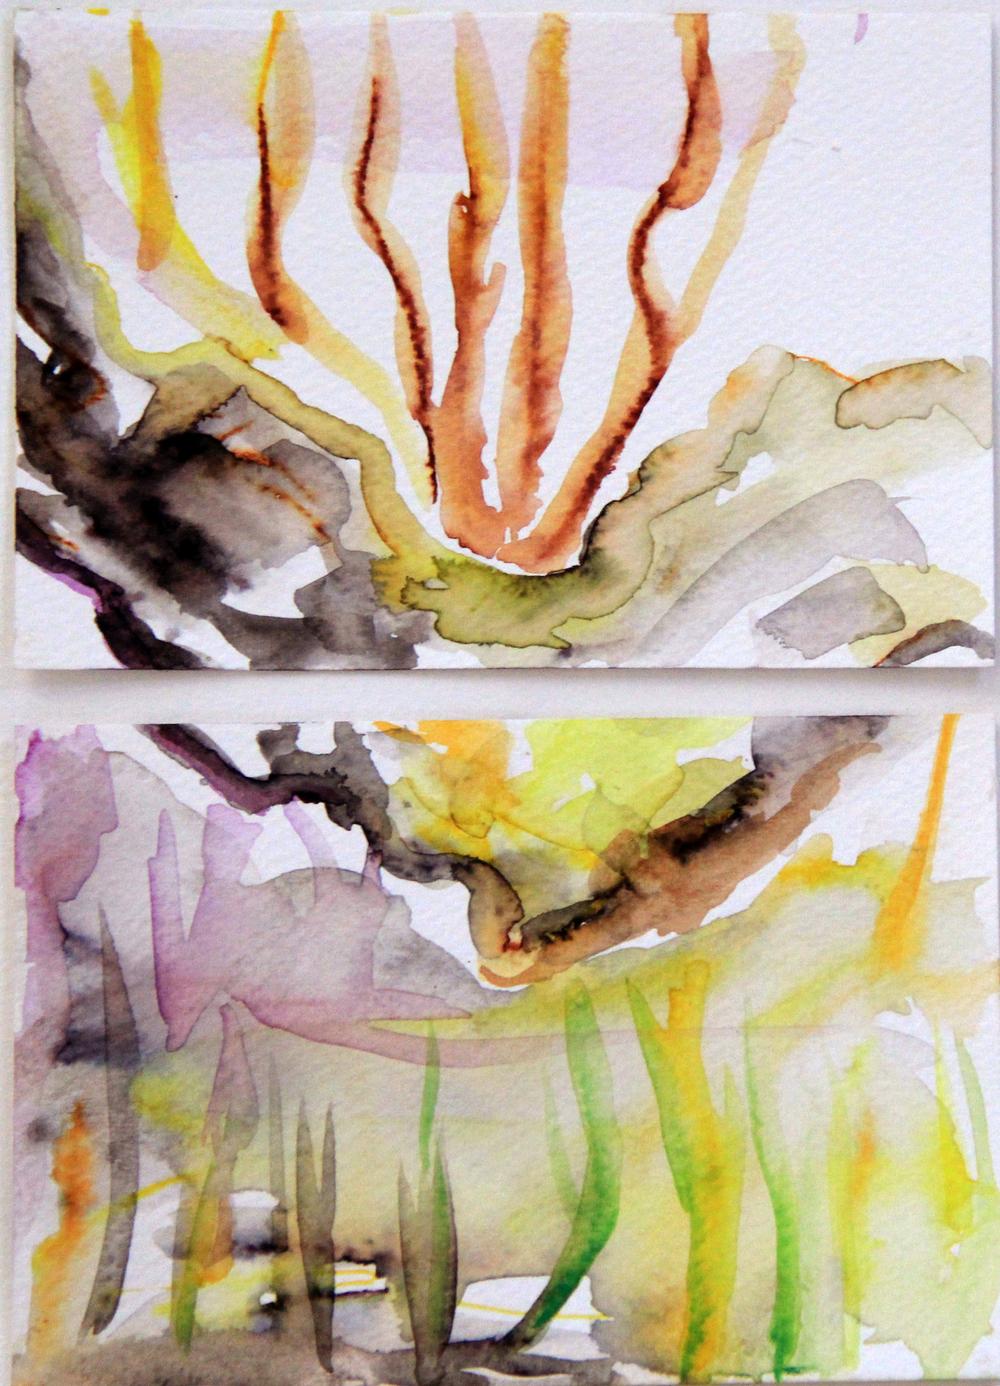 Mangroves_From_The_Water_119_Zahidah_Zeytoun_Showcase.jpg.jpg